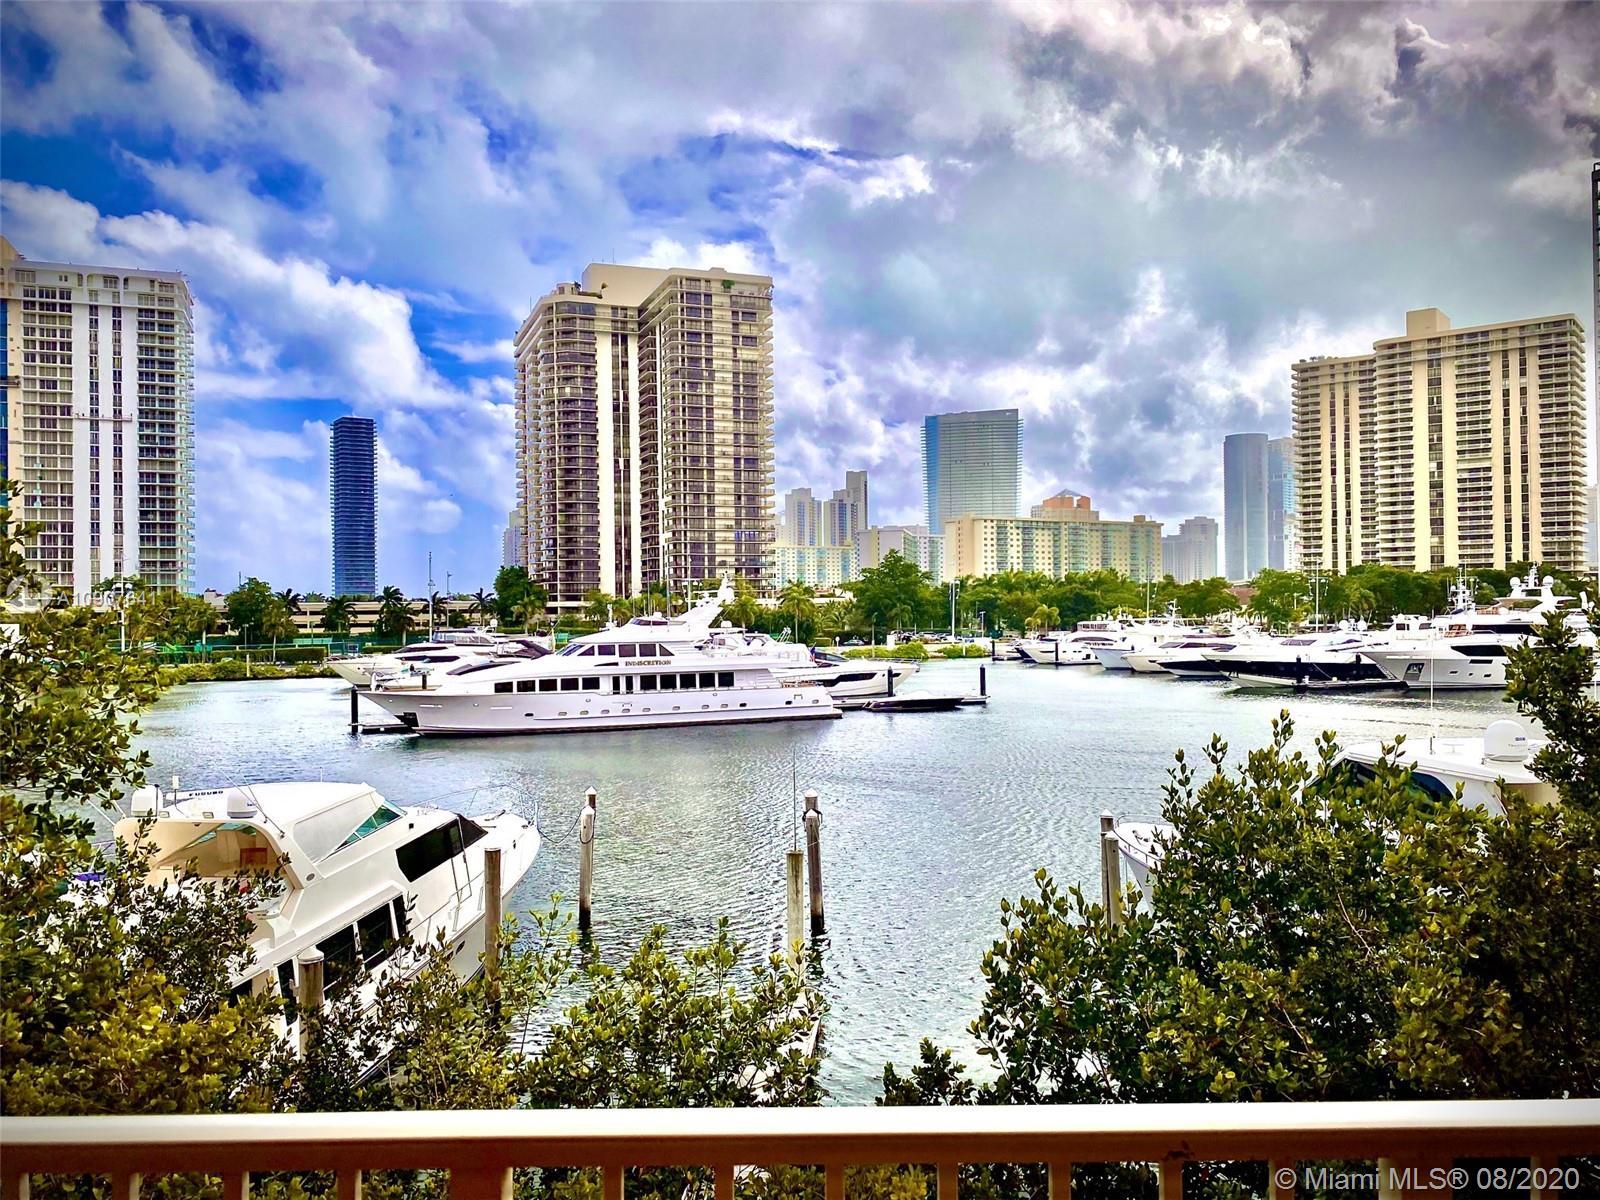 Yacht Club 8 at Aventura #2308 - 19901 E Country Club Dr #2308, Aventura, FL 33180